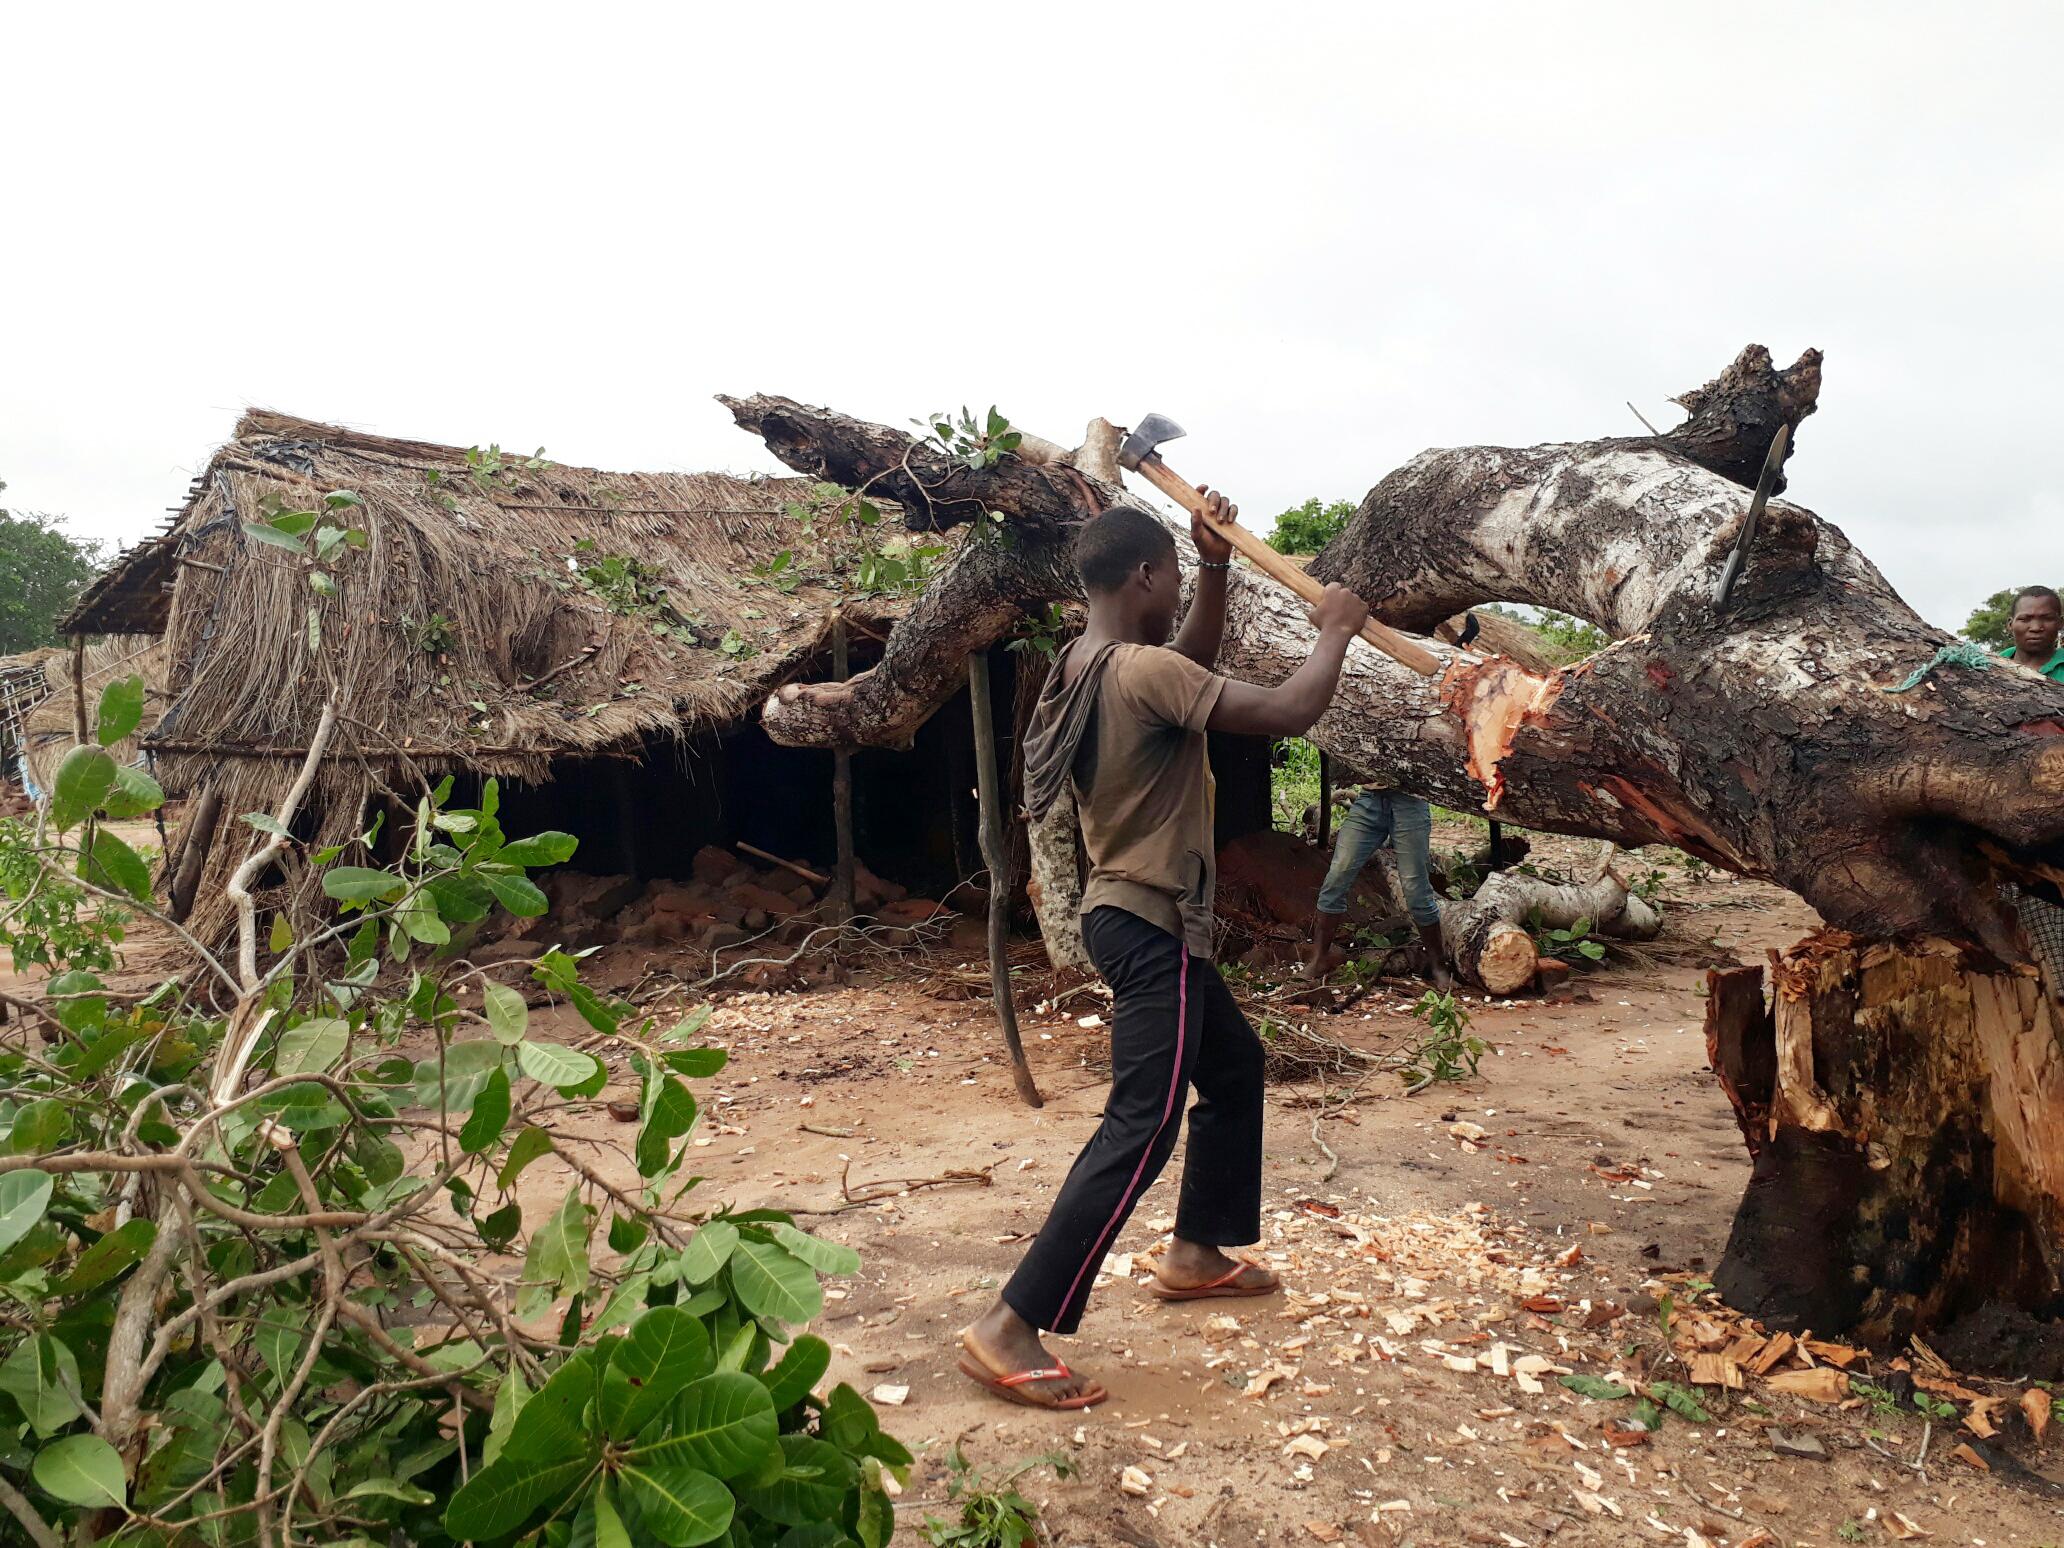 Proyecto: Reconstrucción de capillas en Mozambique